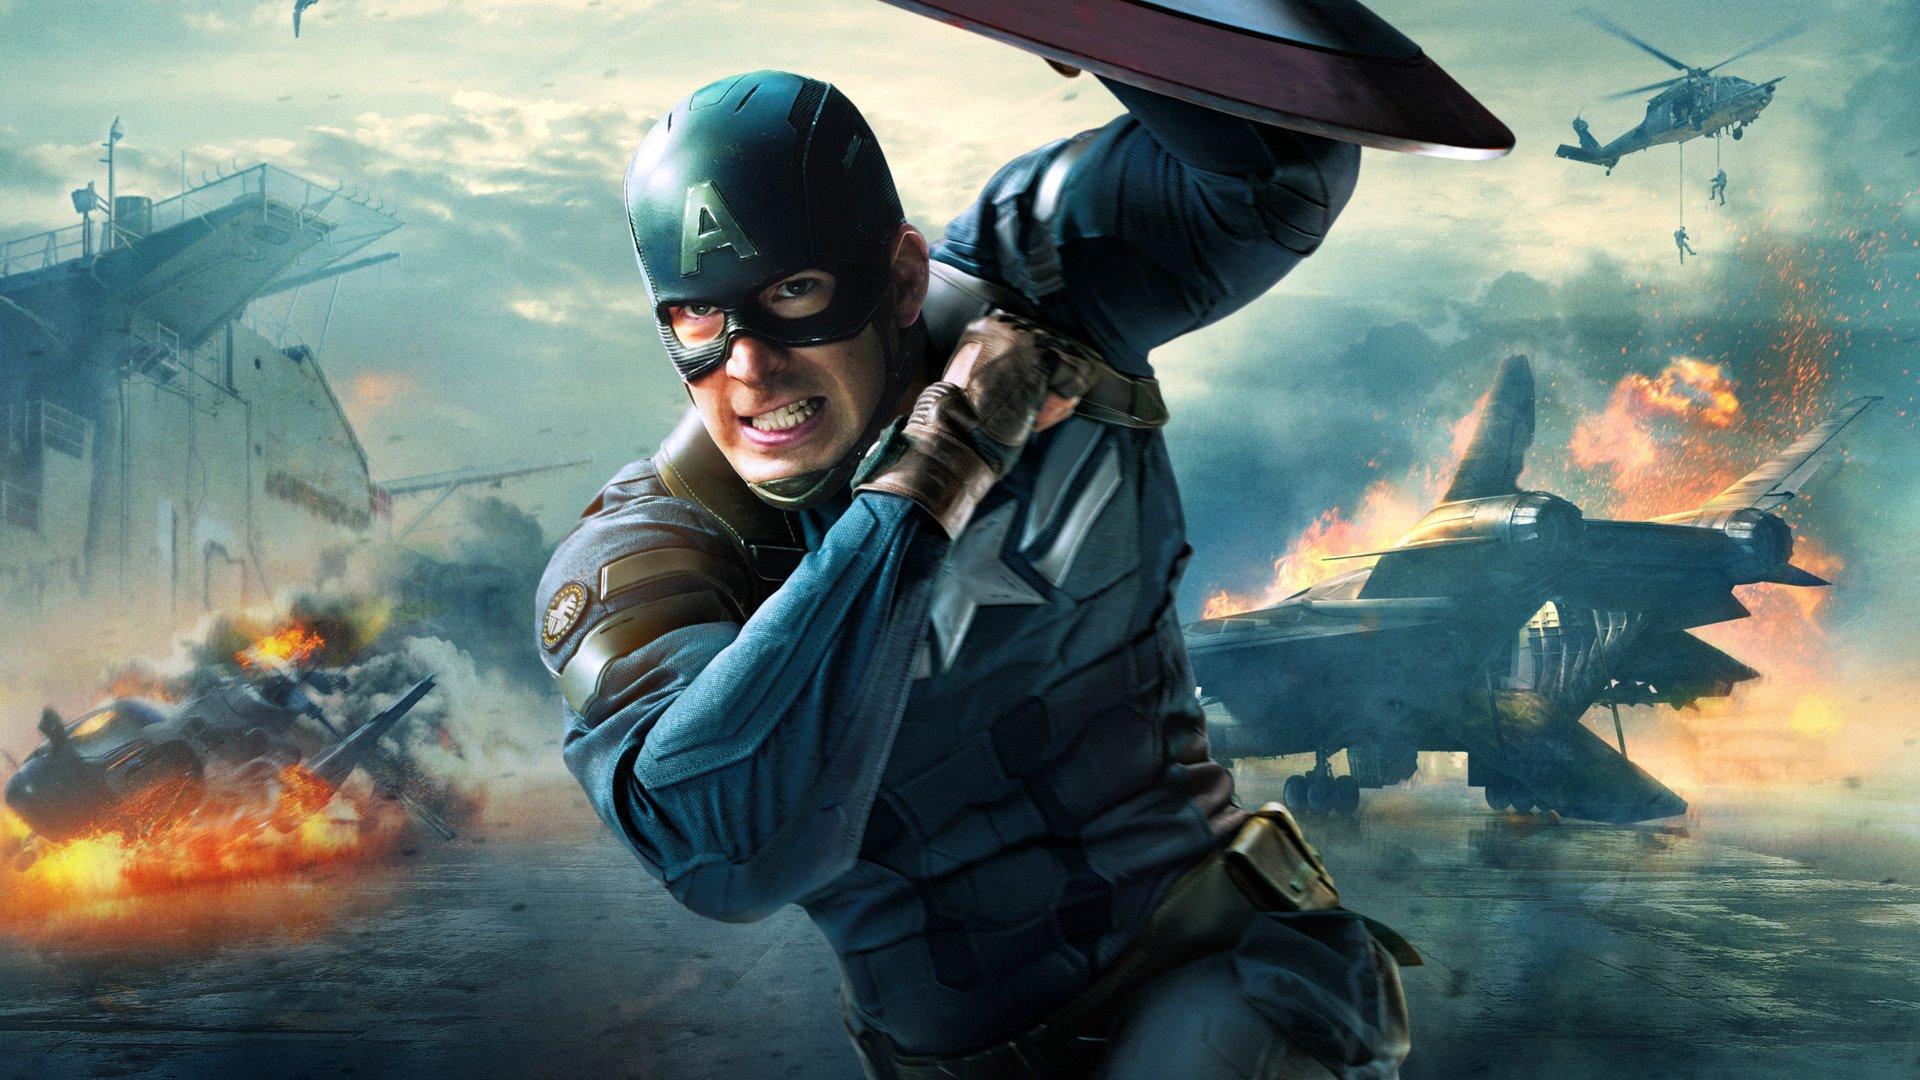 Capetan america superhero movie wallpaper 1920x1080 446887 1920x1080